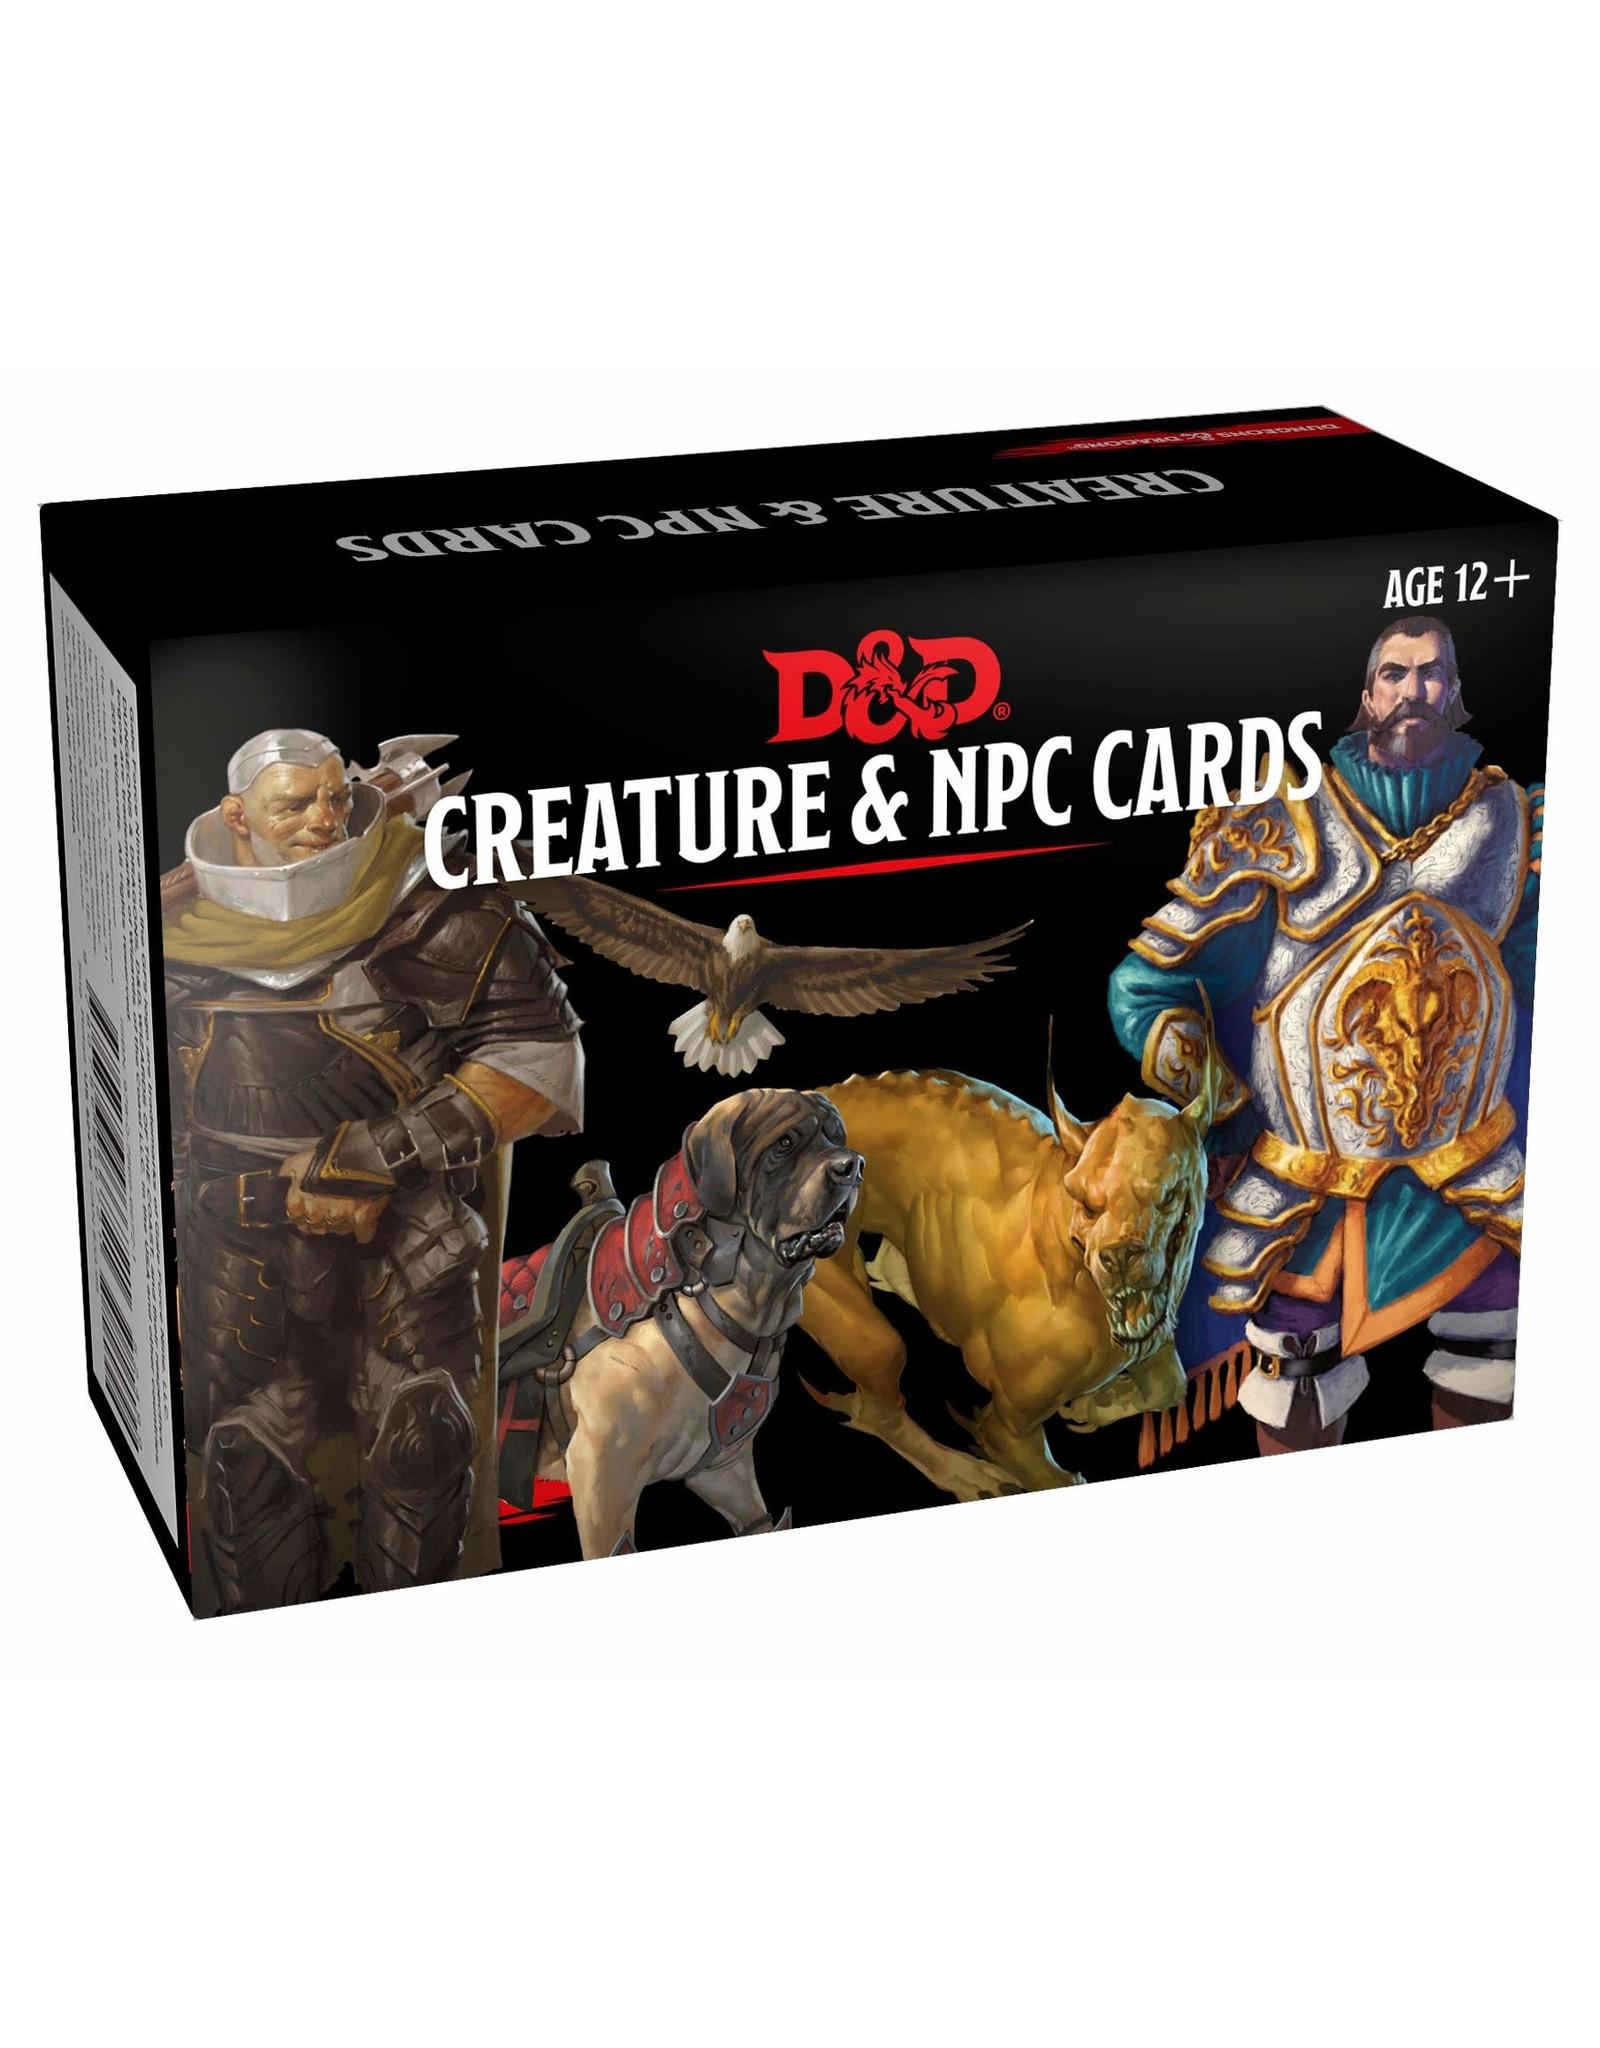 GaleForce9 D&D: Monster Cards - Creature & NPC